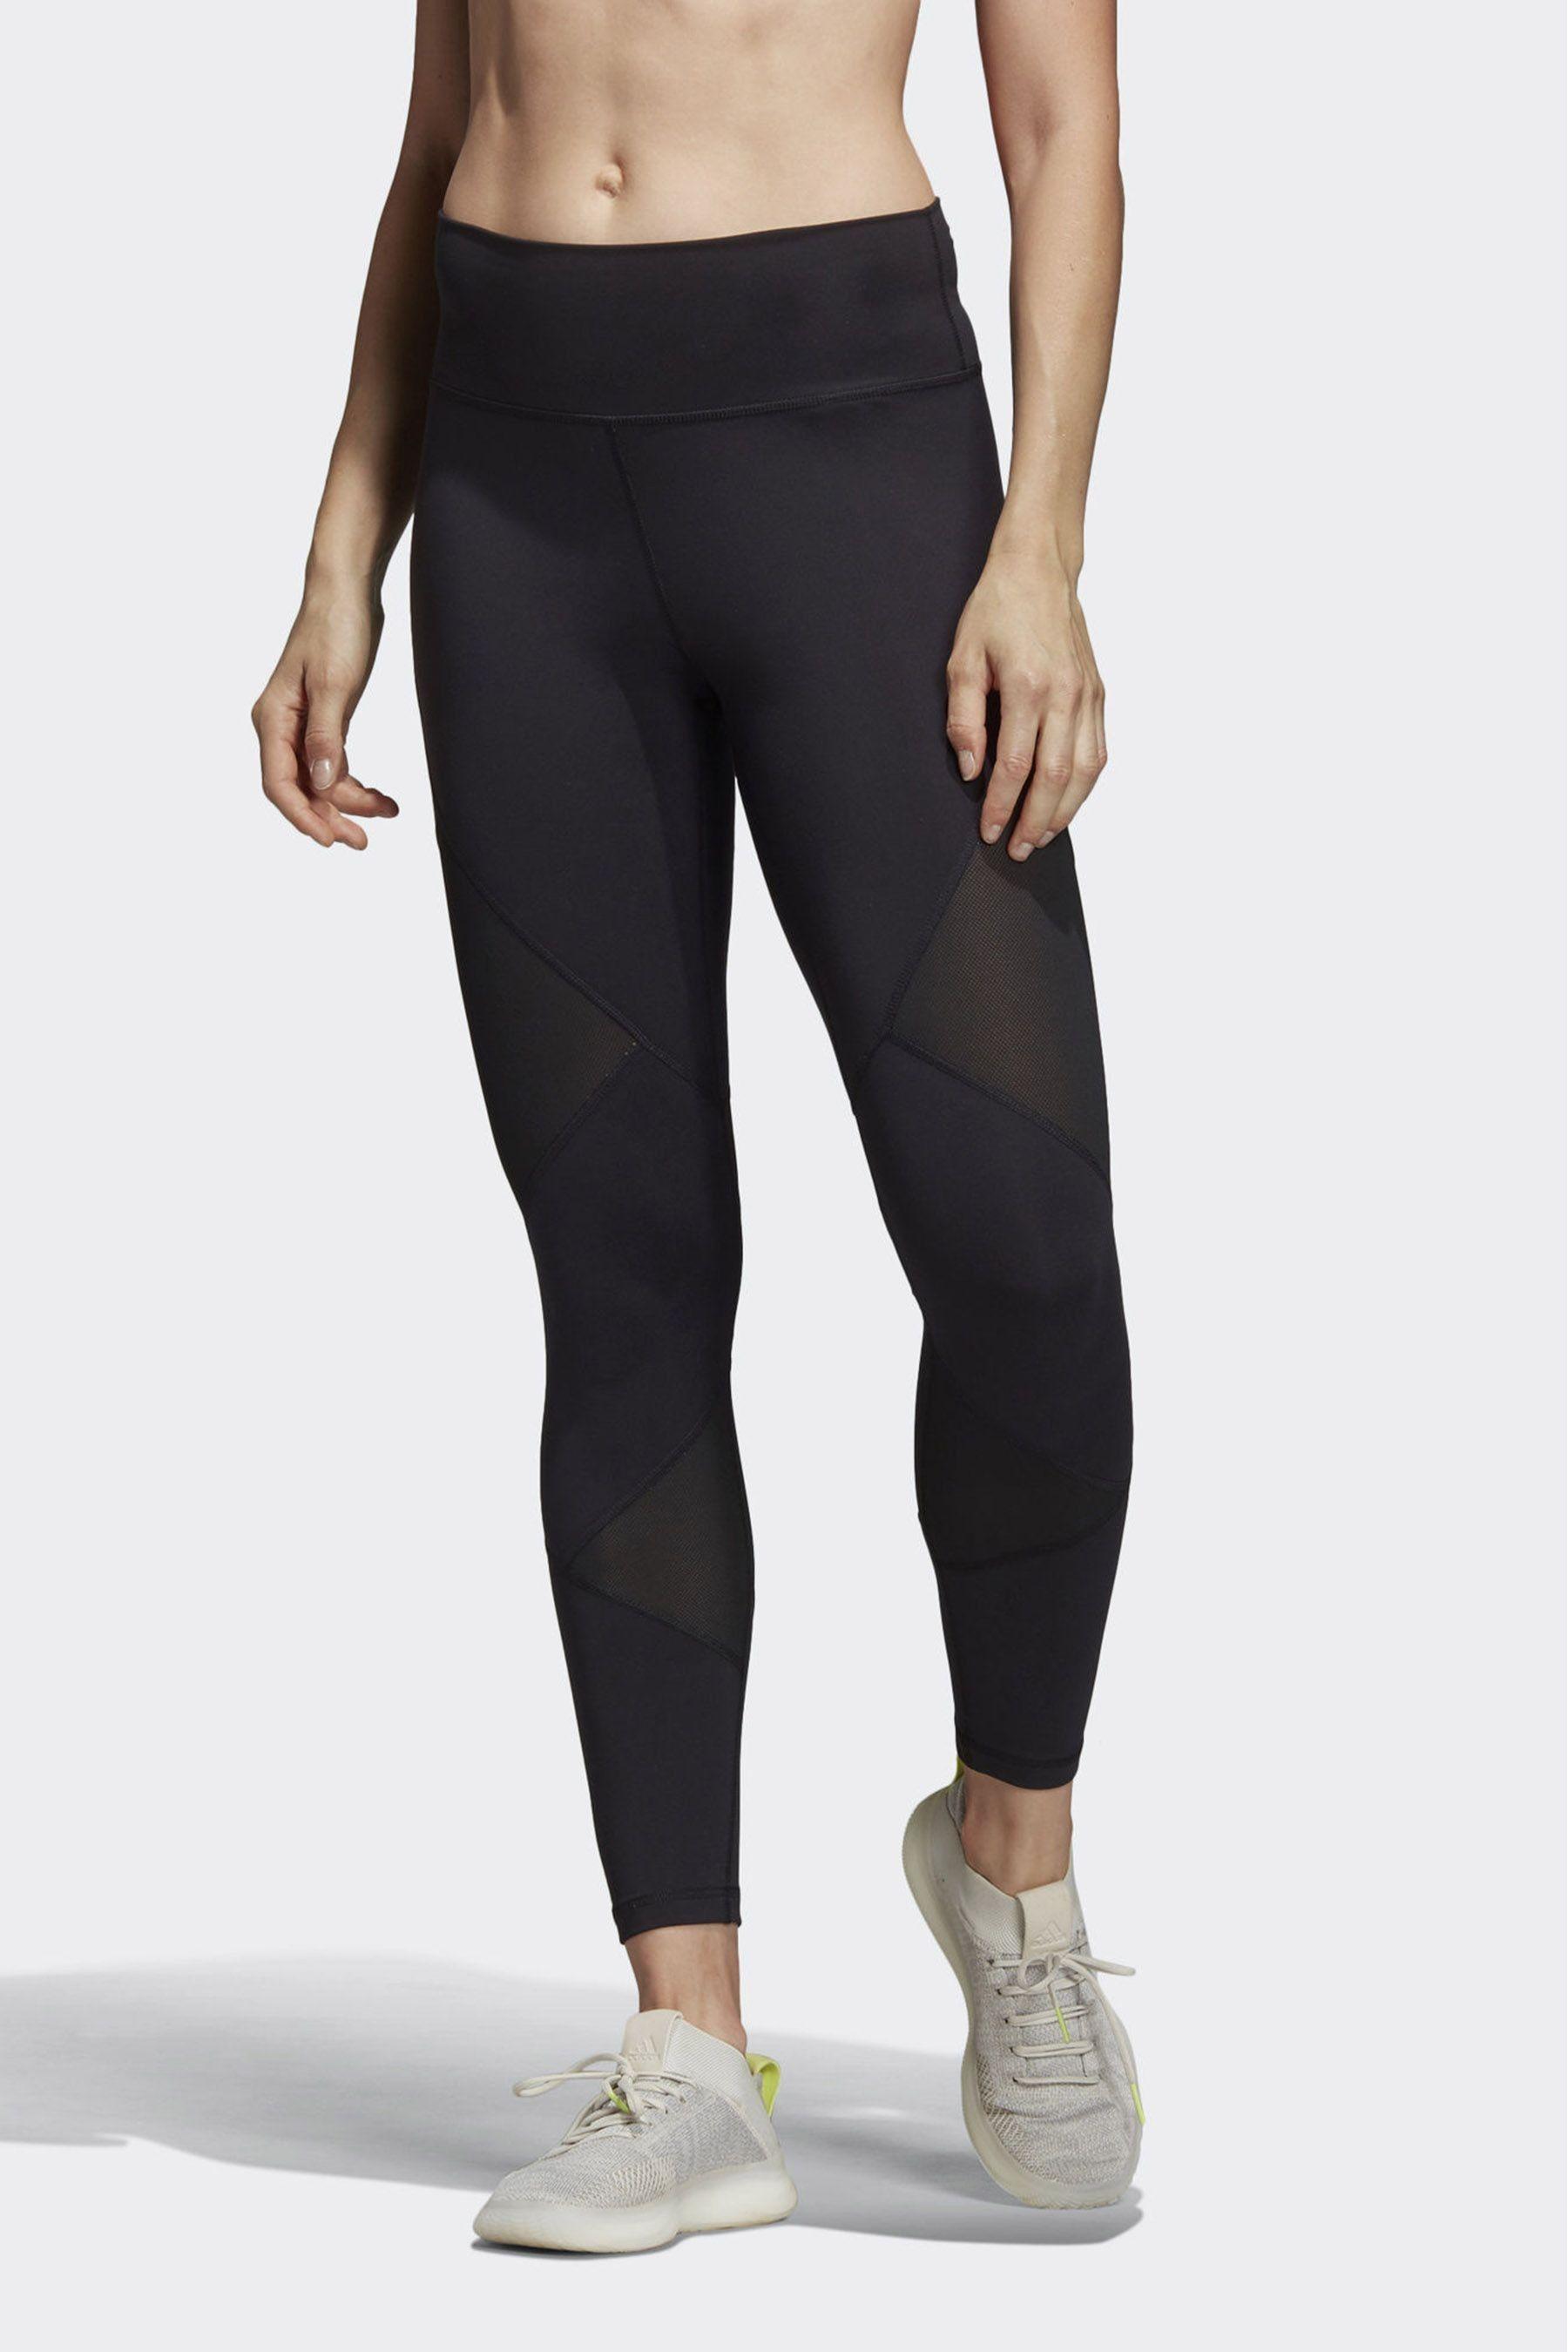 adidas Believe This High Waist 3 Stripe Leggings Black